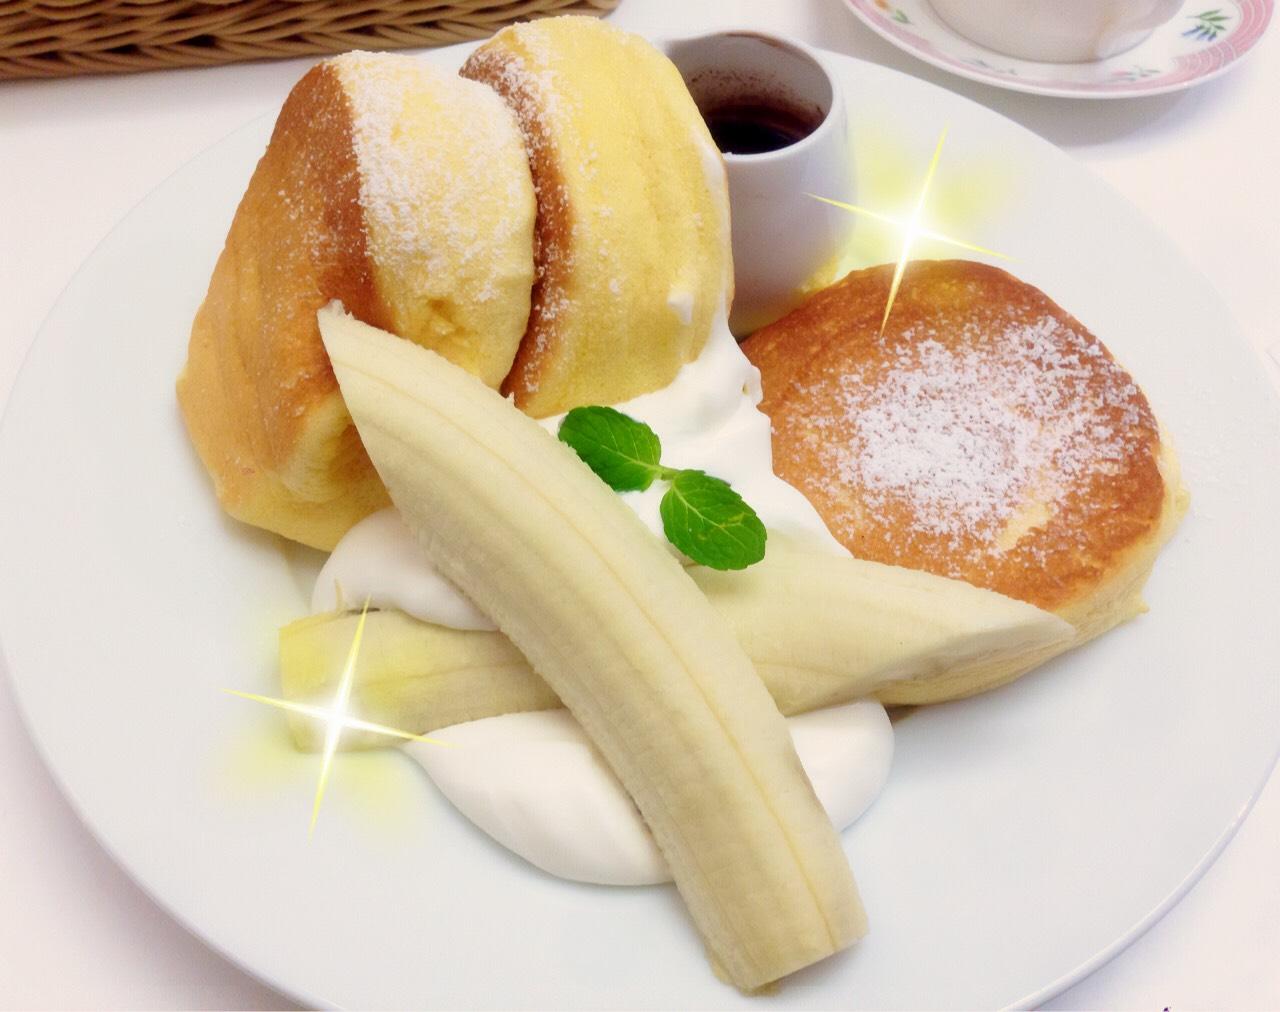 Jk fun souffle pancakes that you should not miss in japan jk fun souffle pancakes that you should not miss in japan follow me to the first shop today a happy pancake ccuart Choice Image